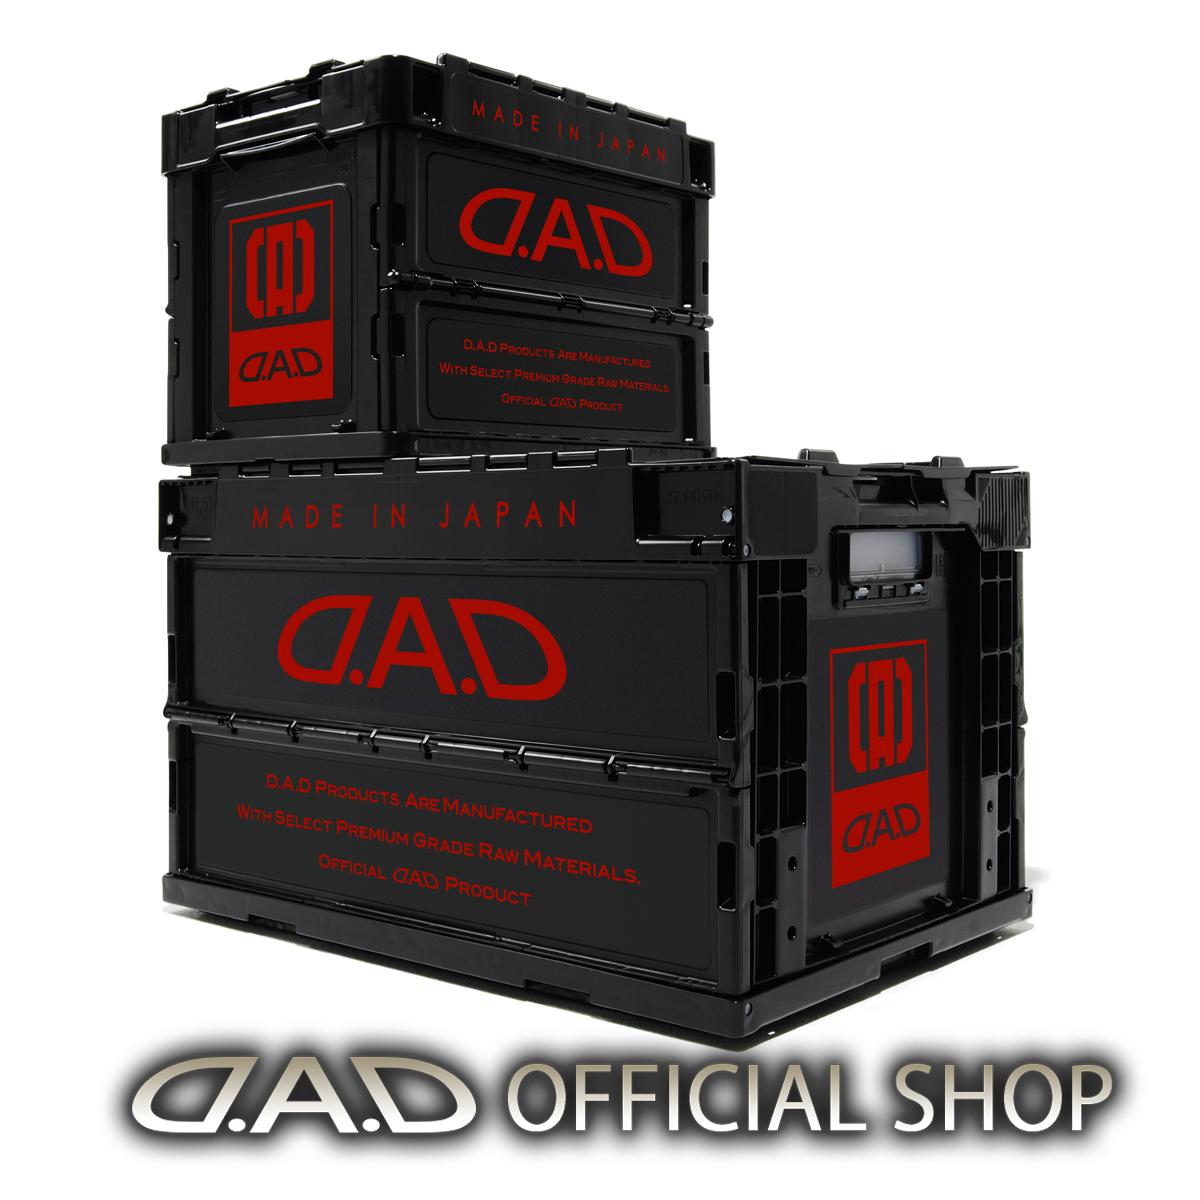 D.A.D OFFICIAL SHOP(公式D.A.Dショップ) 【10/1限定!ポイント最大26.5倍!】DAD ギャルソン D.A.Dコンテナボックス 20L ブラック/レッド HA574 折りたたみコンテナ GARSON